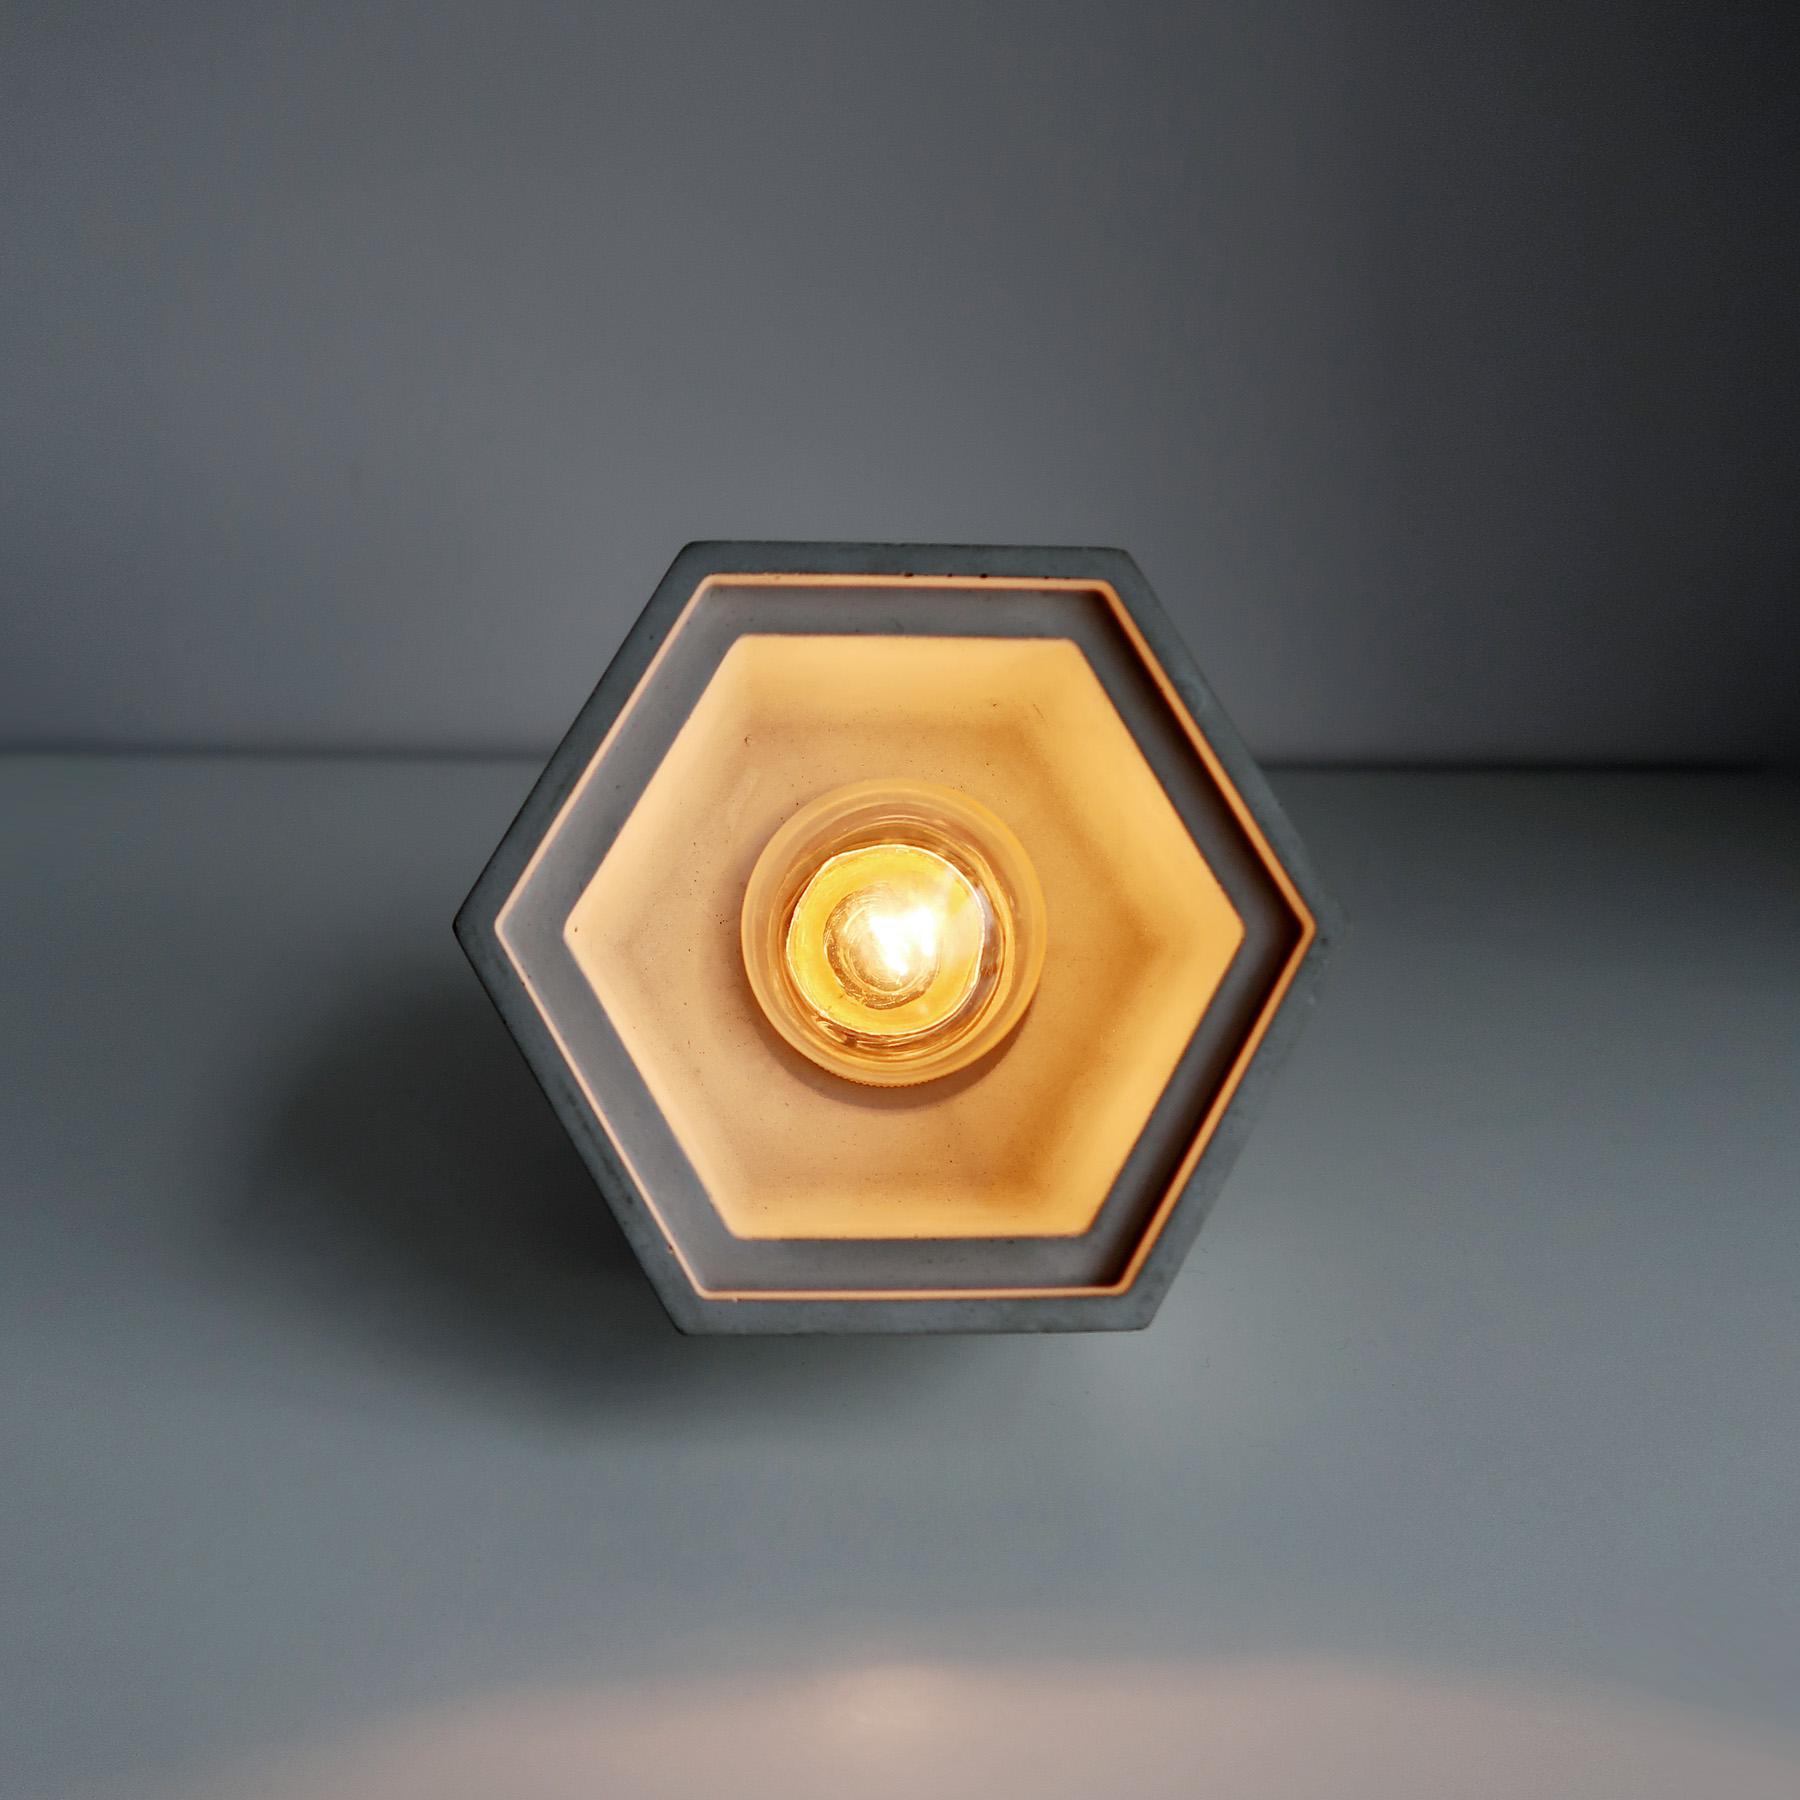 HALO Pendant lamp 光圈黃銅六邊型斜角水泥桌燈・水泥吊燈